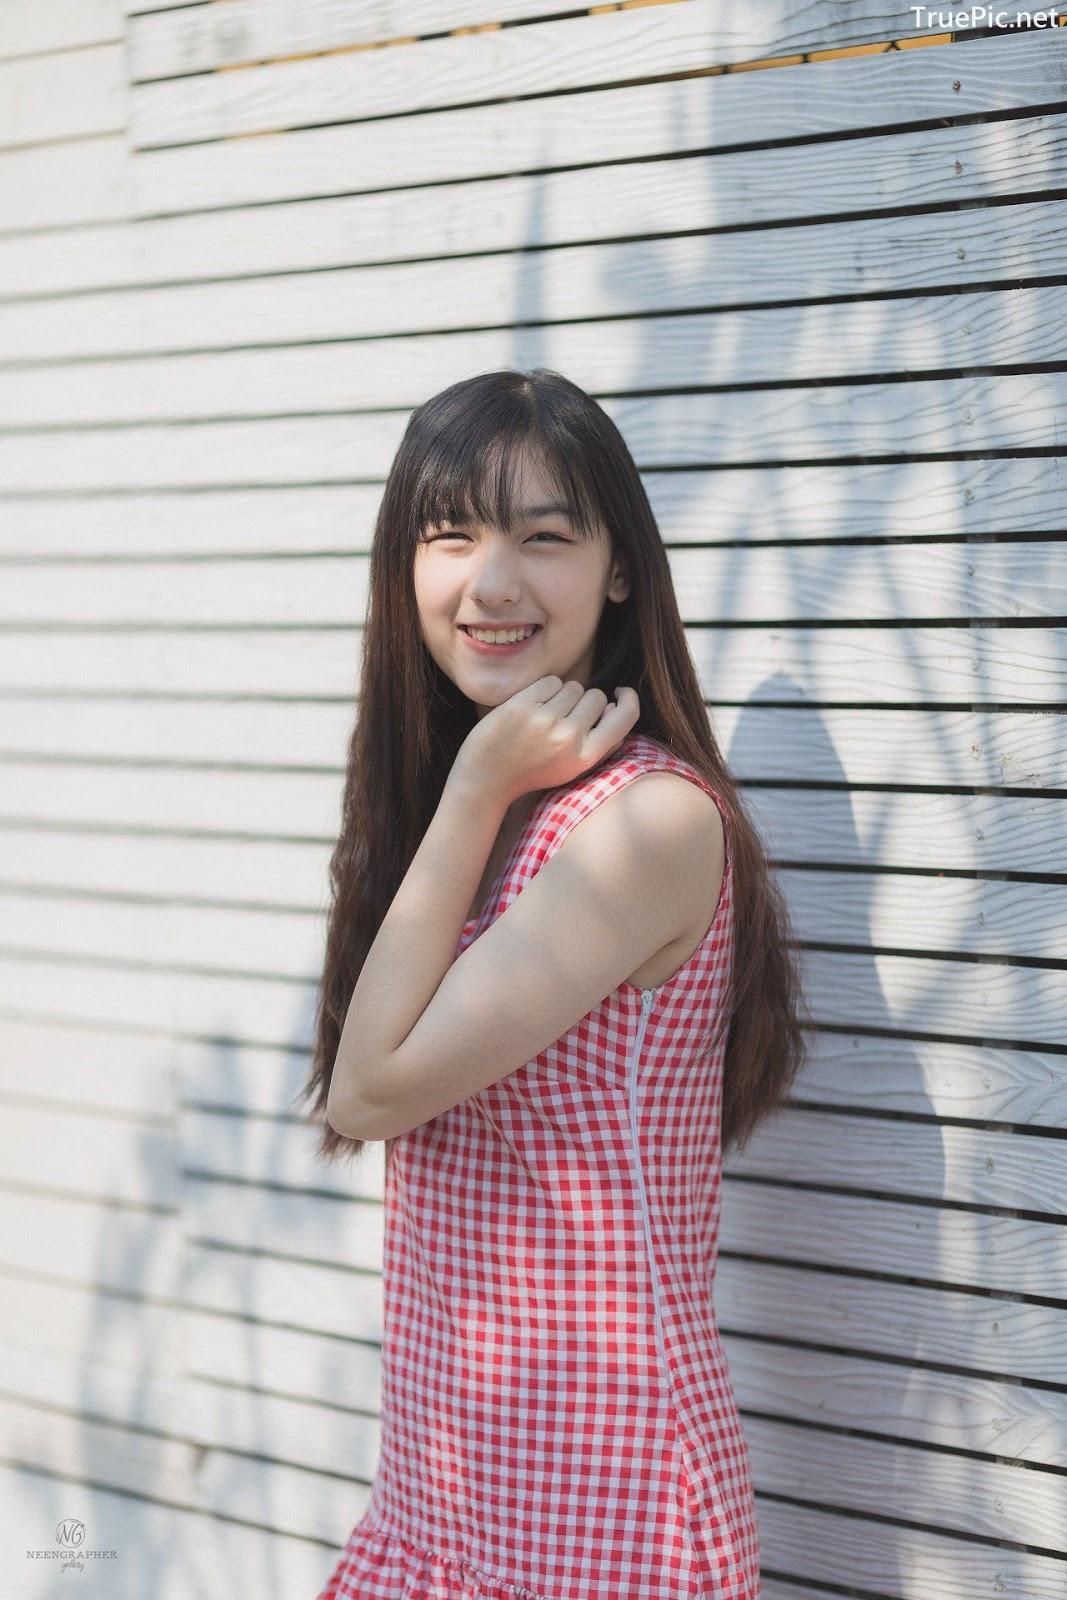 Image-Thailand-Cute-Model-Emma-Panisara–Album-Emma-Bright-Sunday-TruePic.net- Picture-23